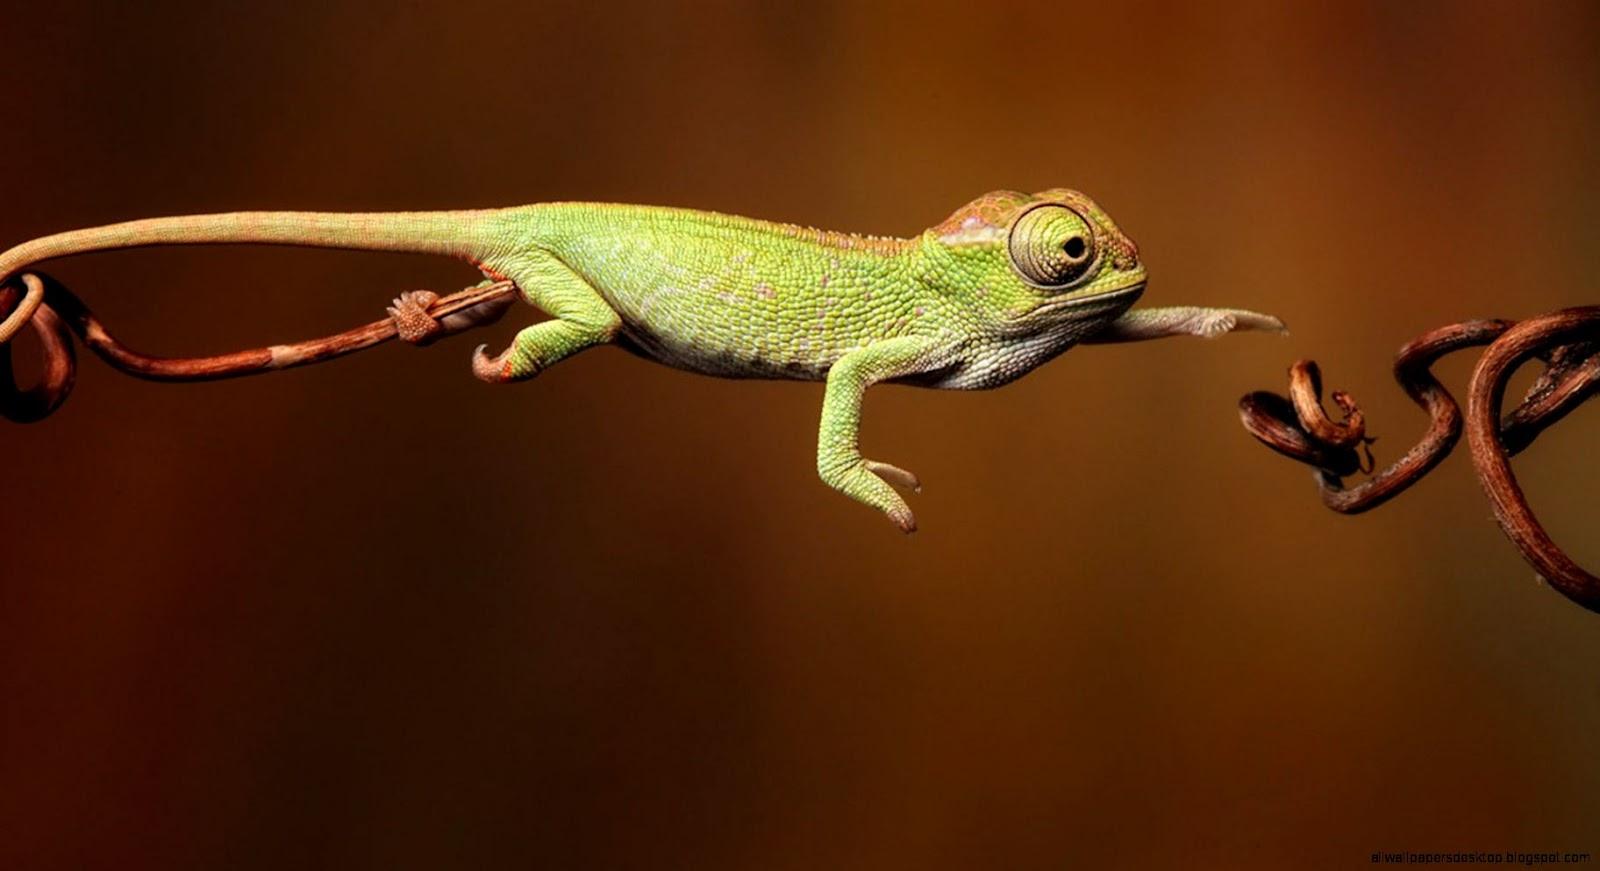 Cute Baby Chameleon